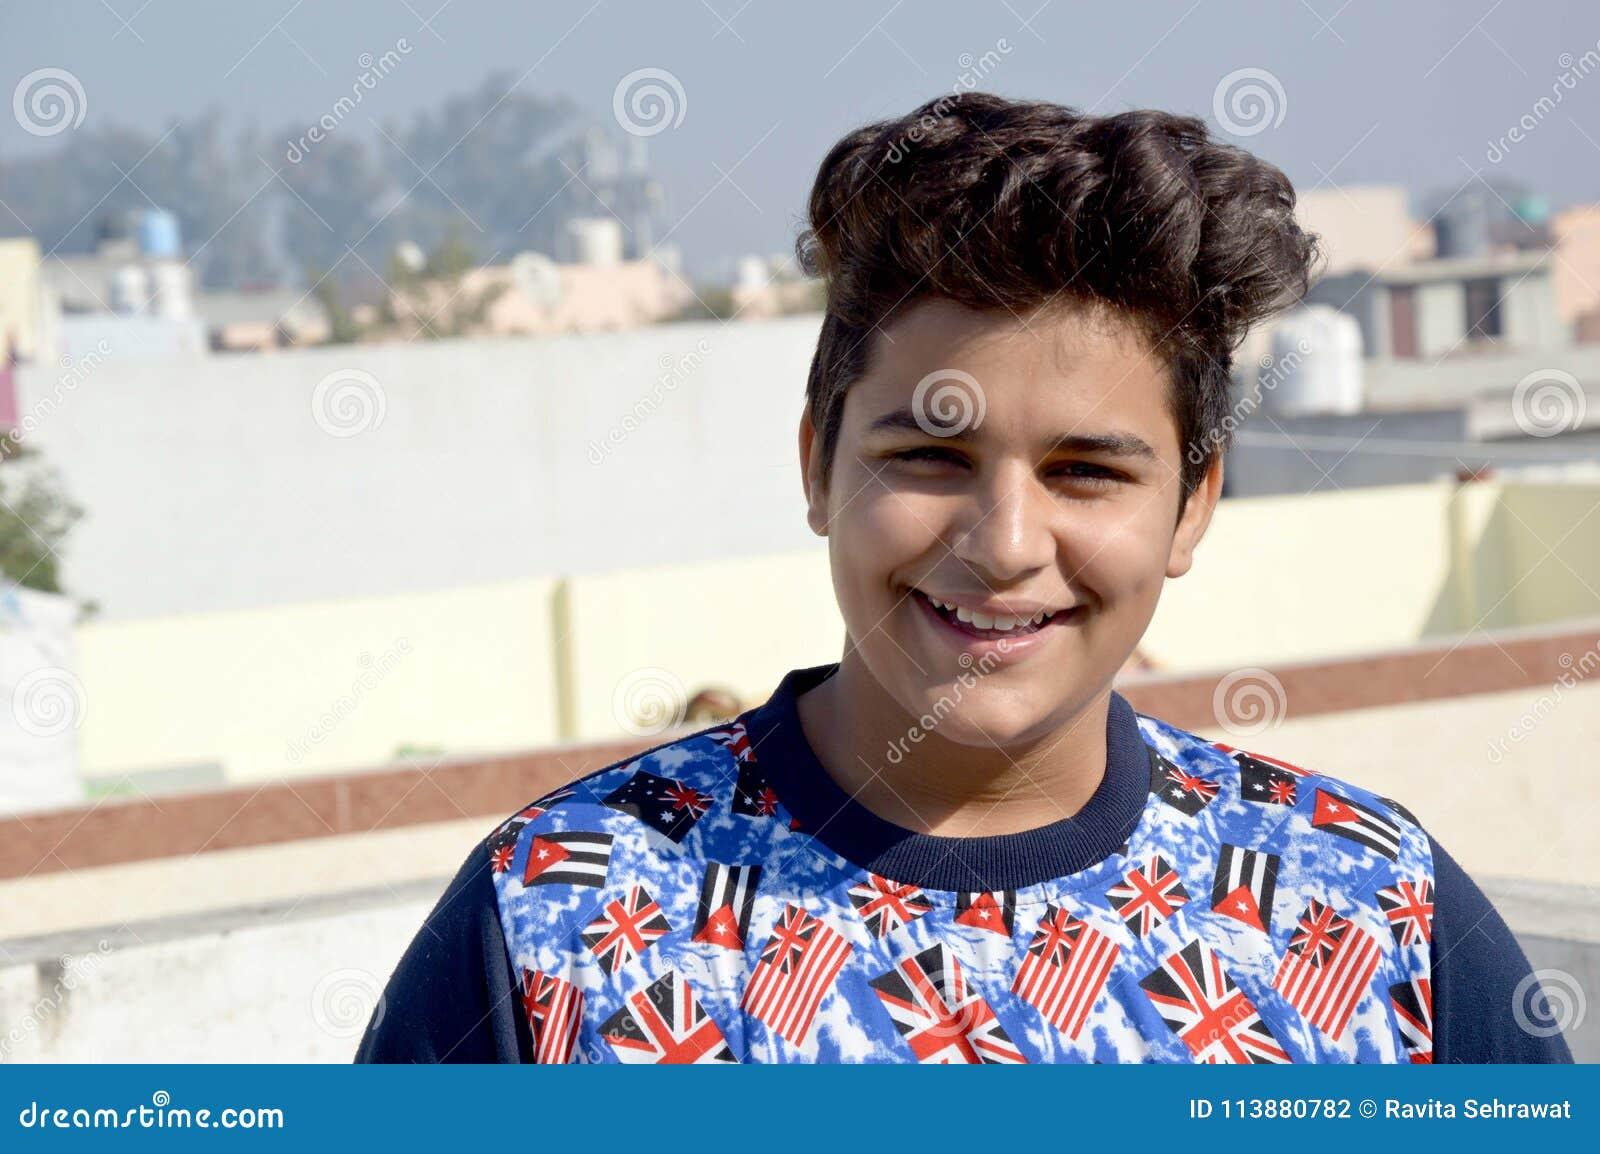 Teenage Boy Standing On House Roof For Taking Sunbath  Stock